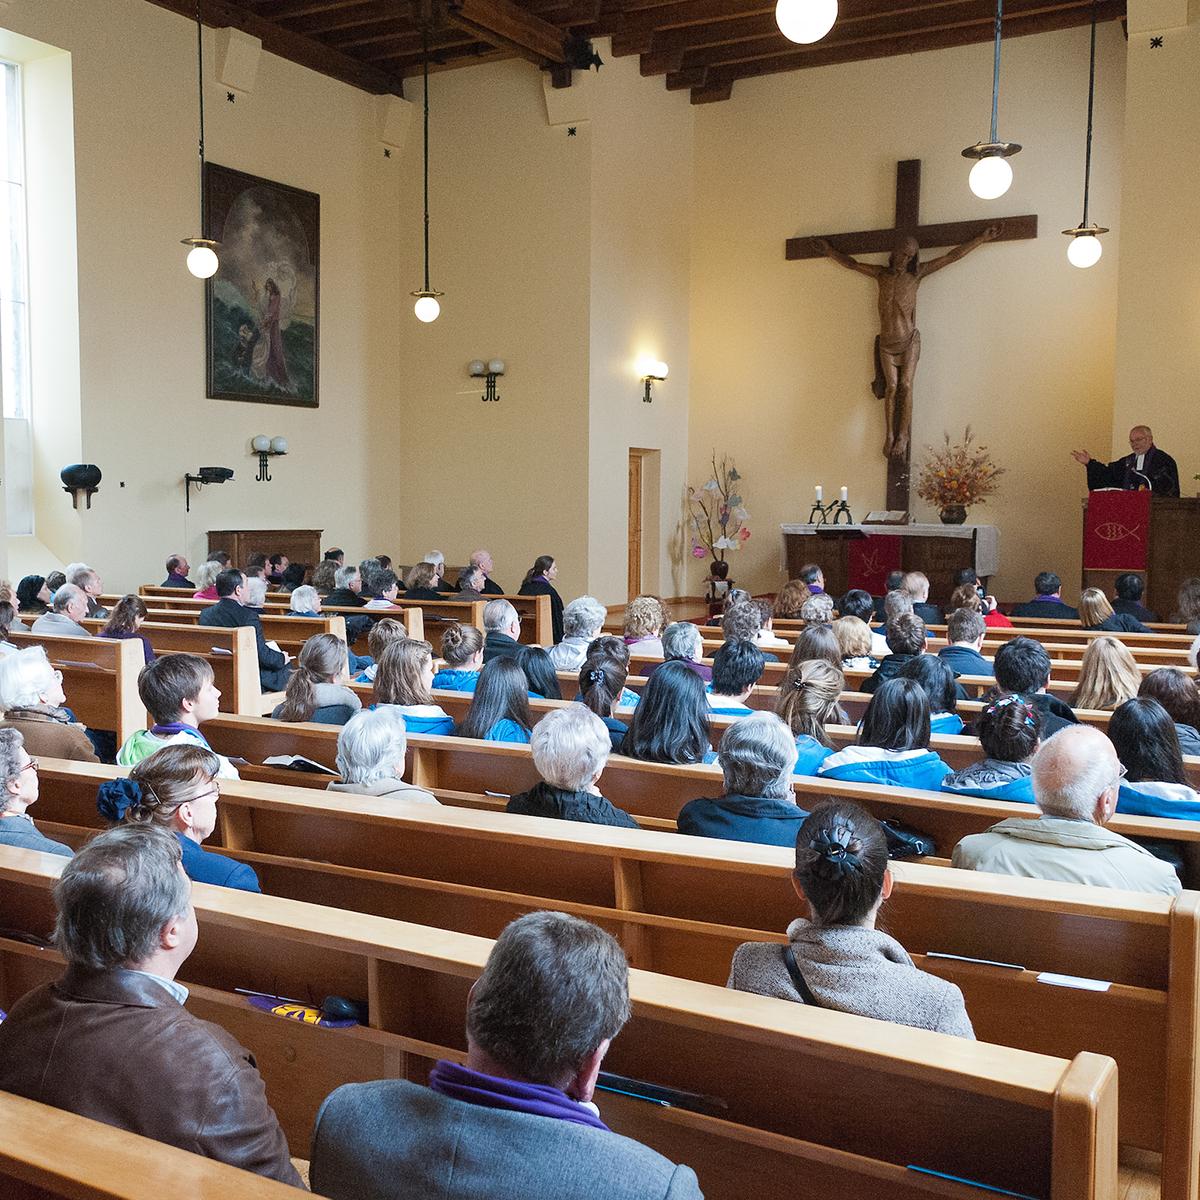 iglesia-luterana-en-osorno